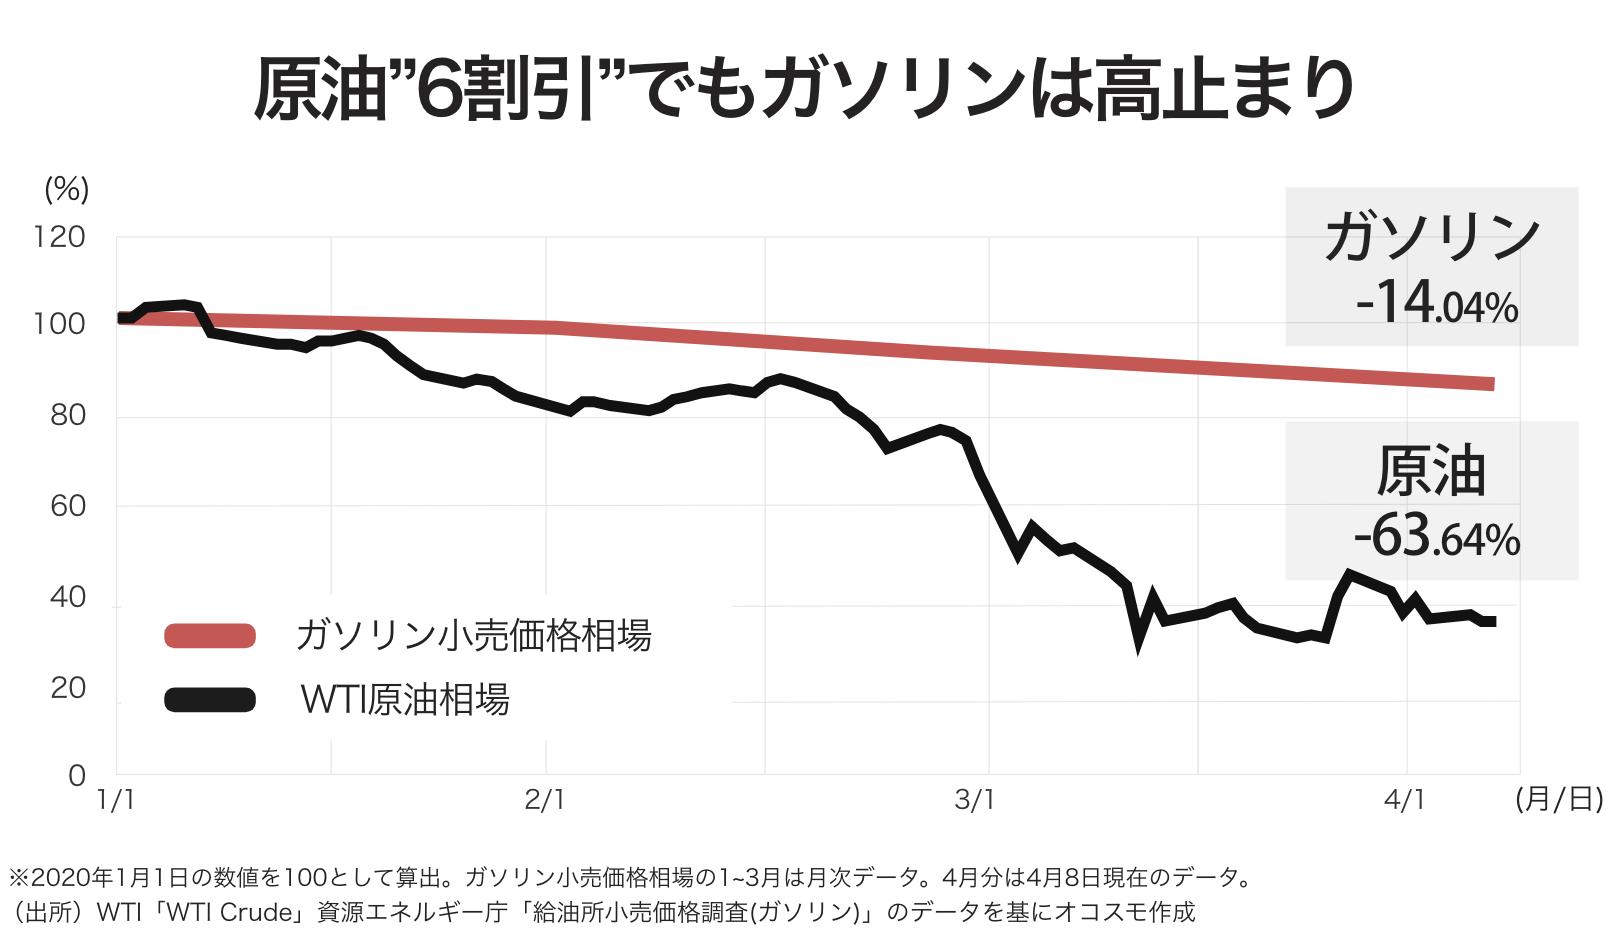 価格 原油 今日 の